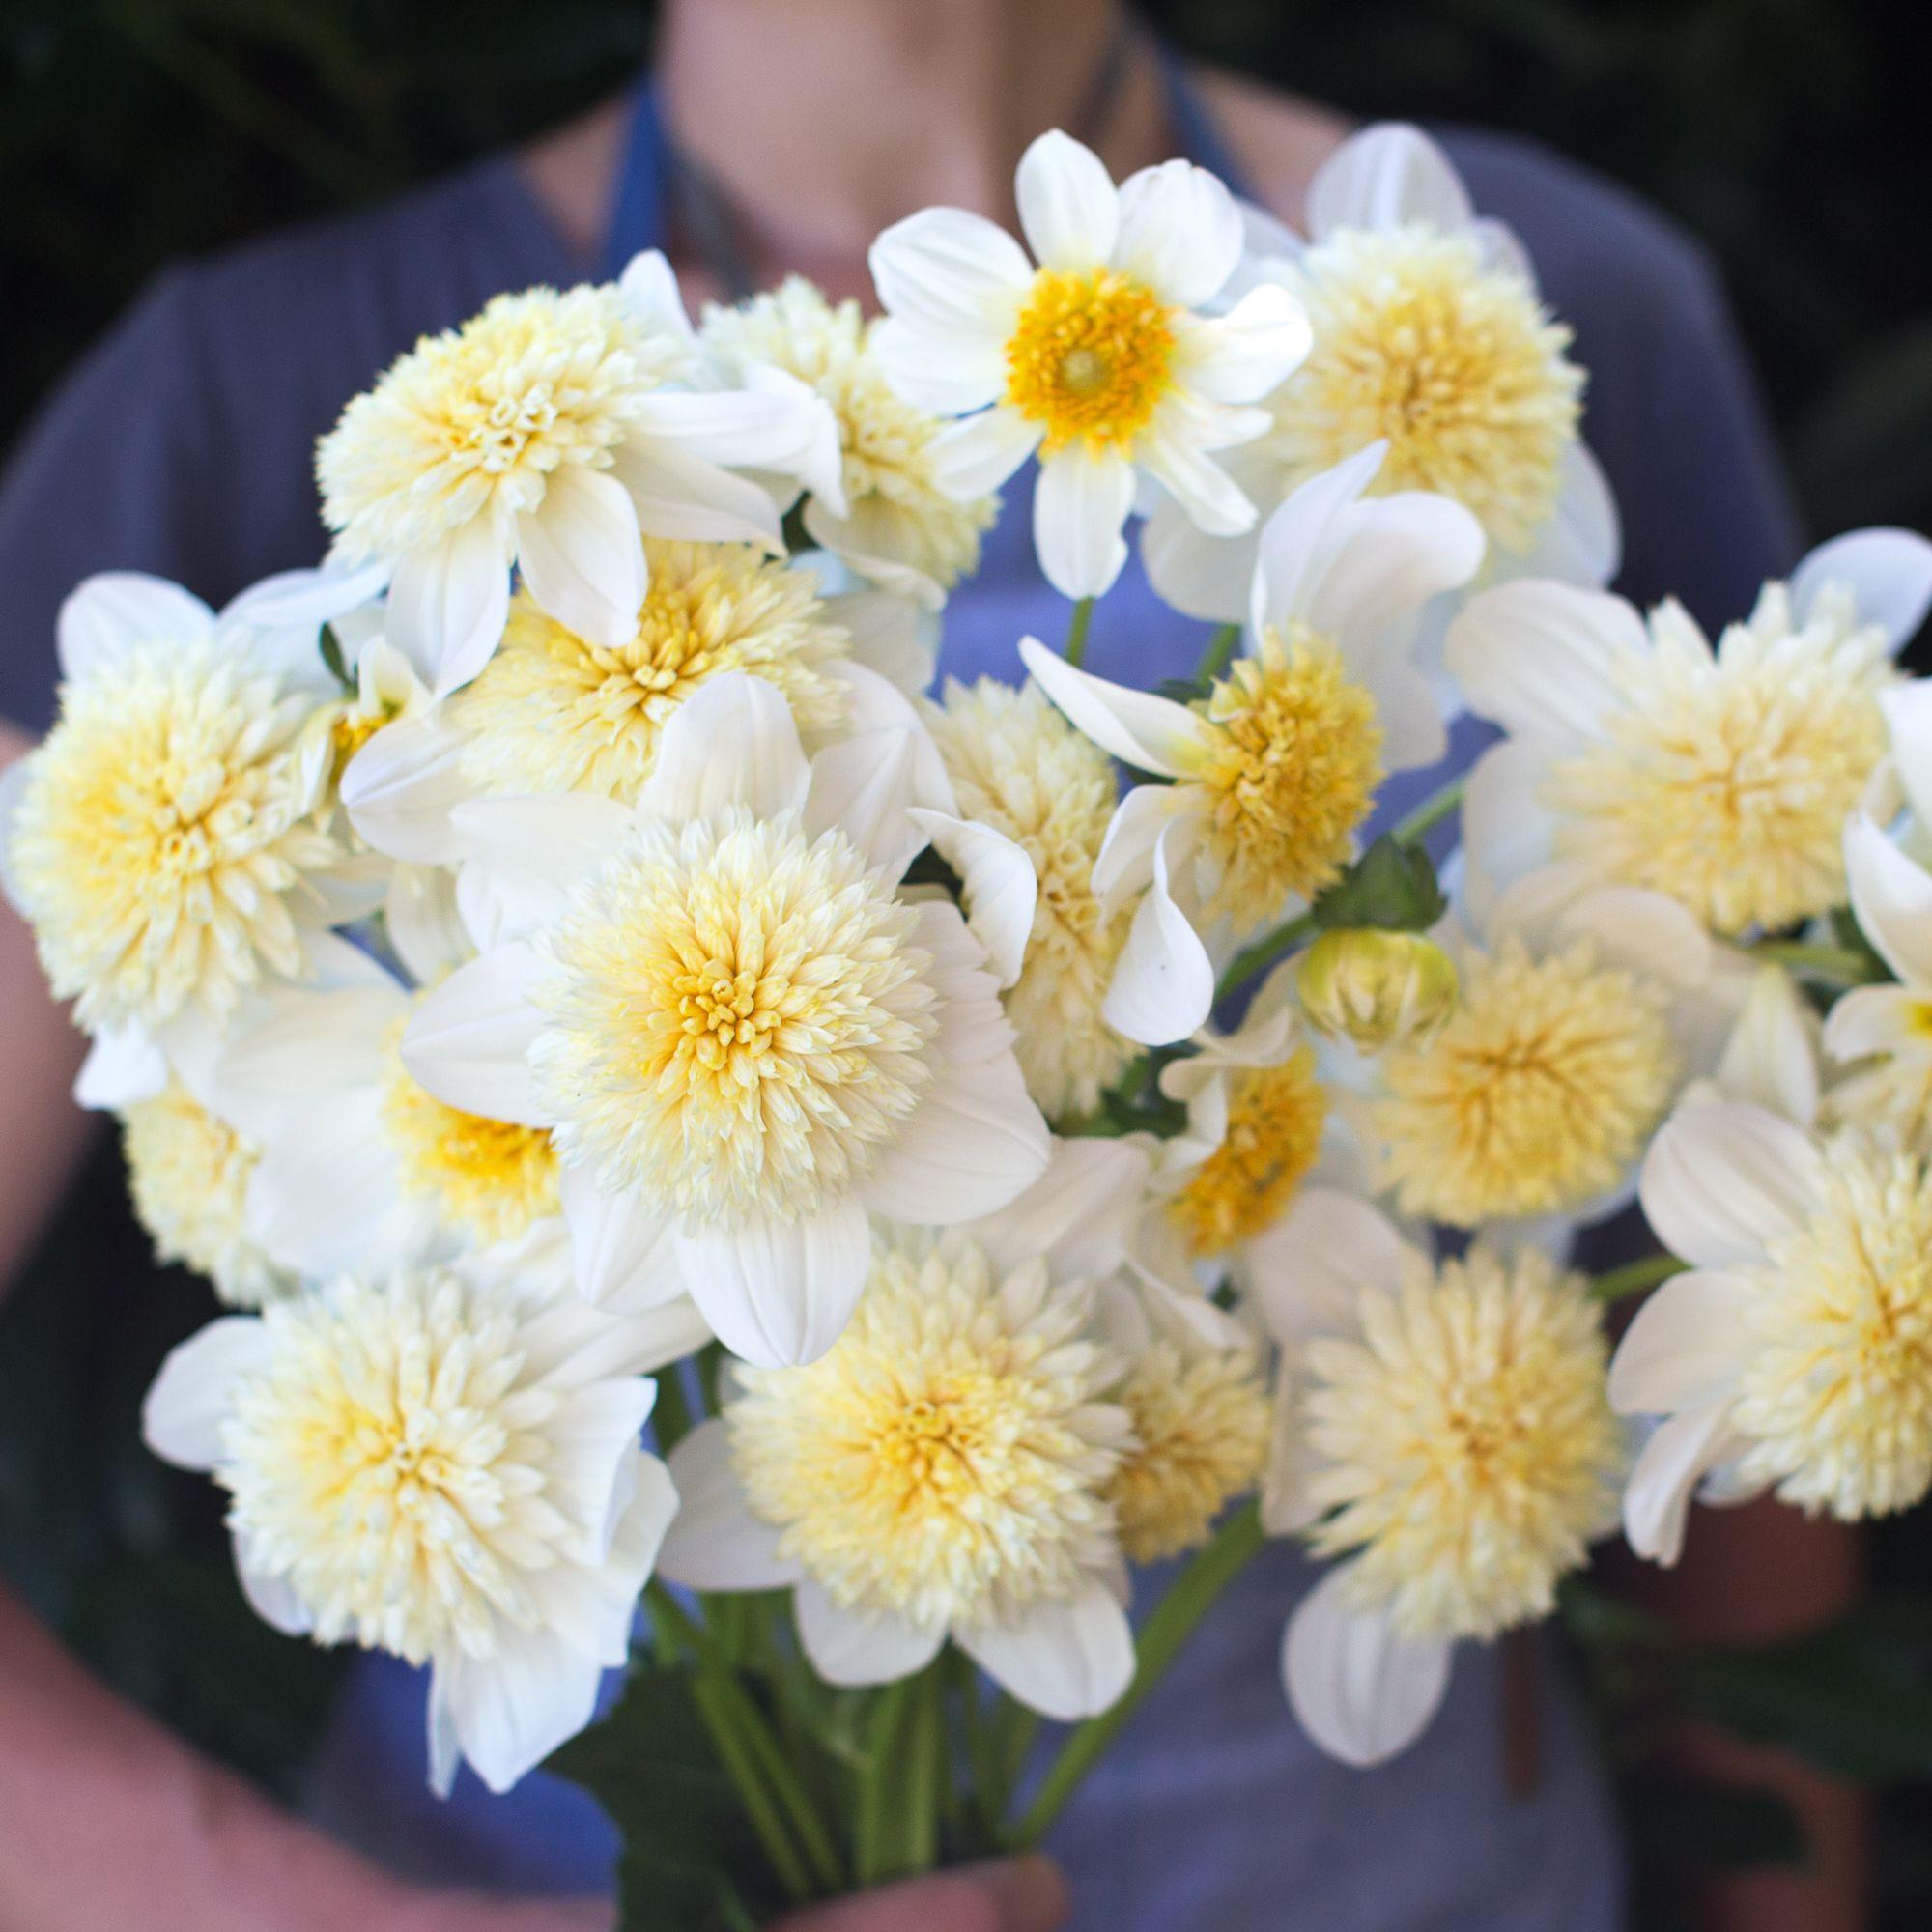 Dahlia platinum blonde blondes dahlia and flower types product description dahlia platinum blonde one of the most unusual varieties we grow flowers resemble double flowered echinacea izmirmasajfo